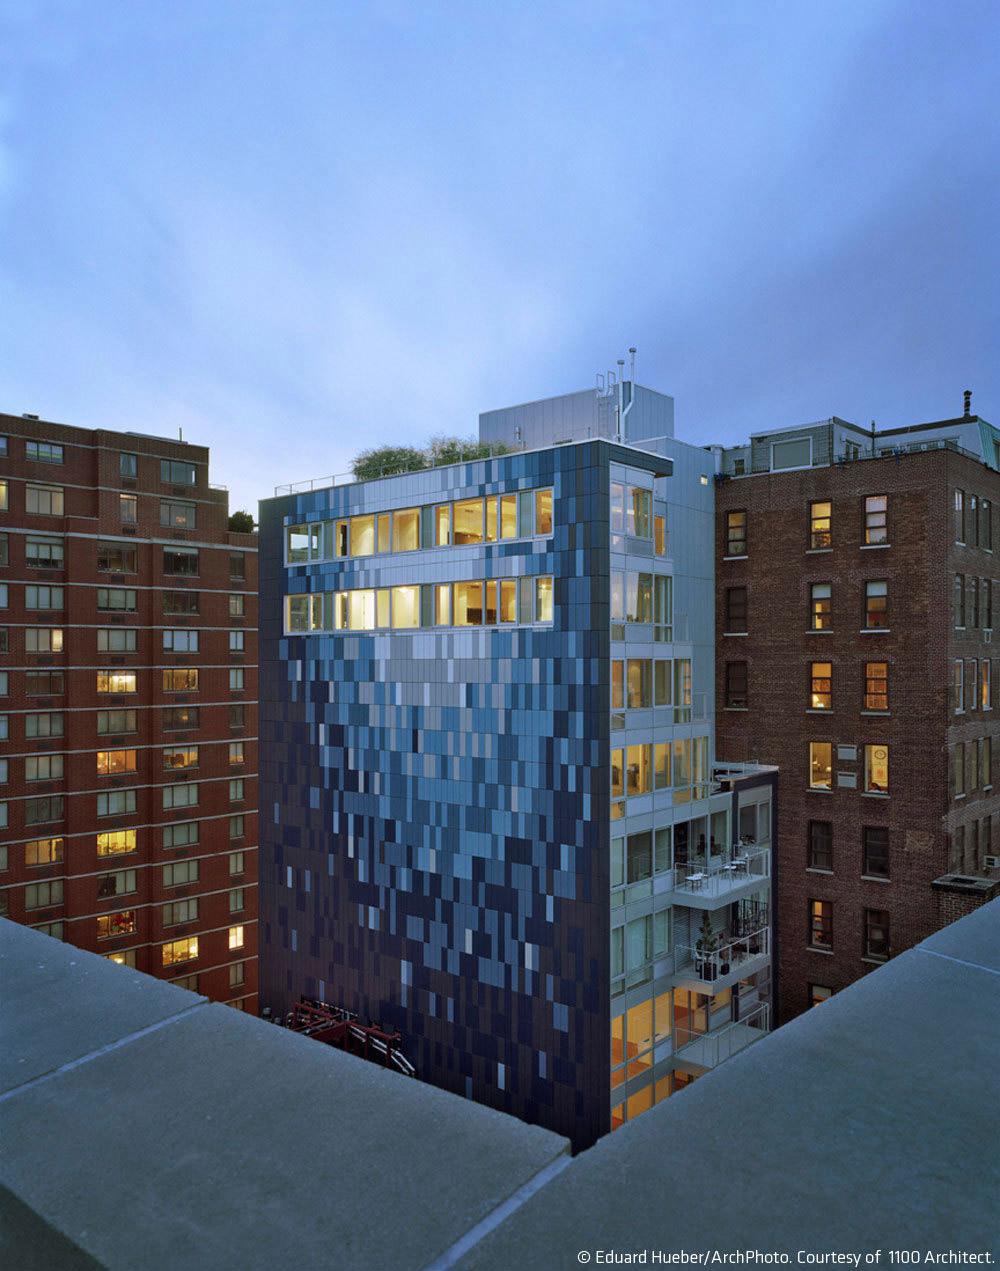 Avant Chelsea in New York City by 1100 Architect (Photo: Eduard Hueber/ArchPhoto)